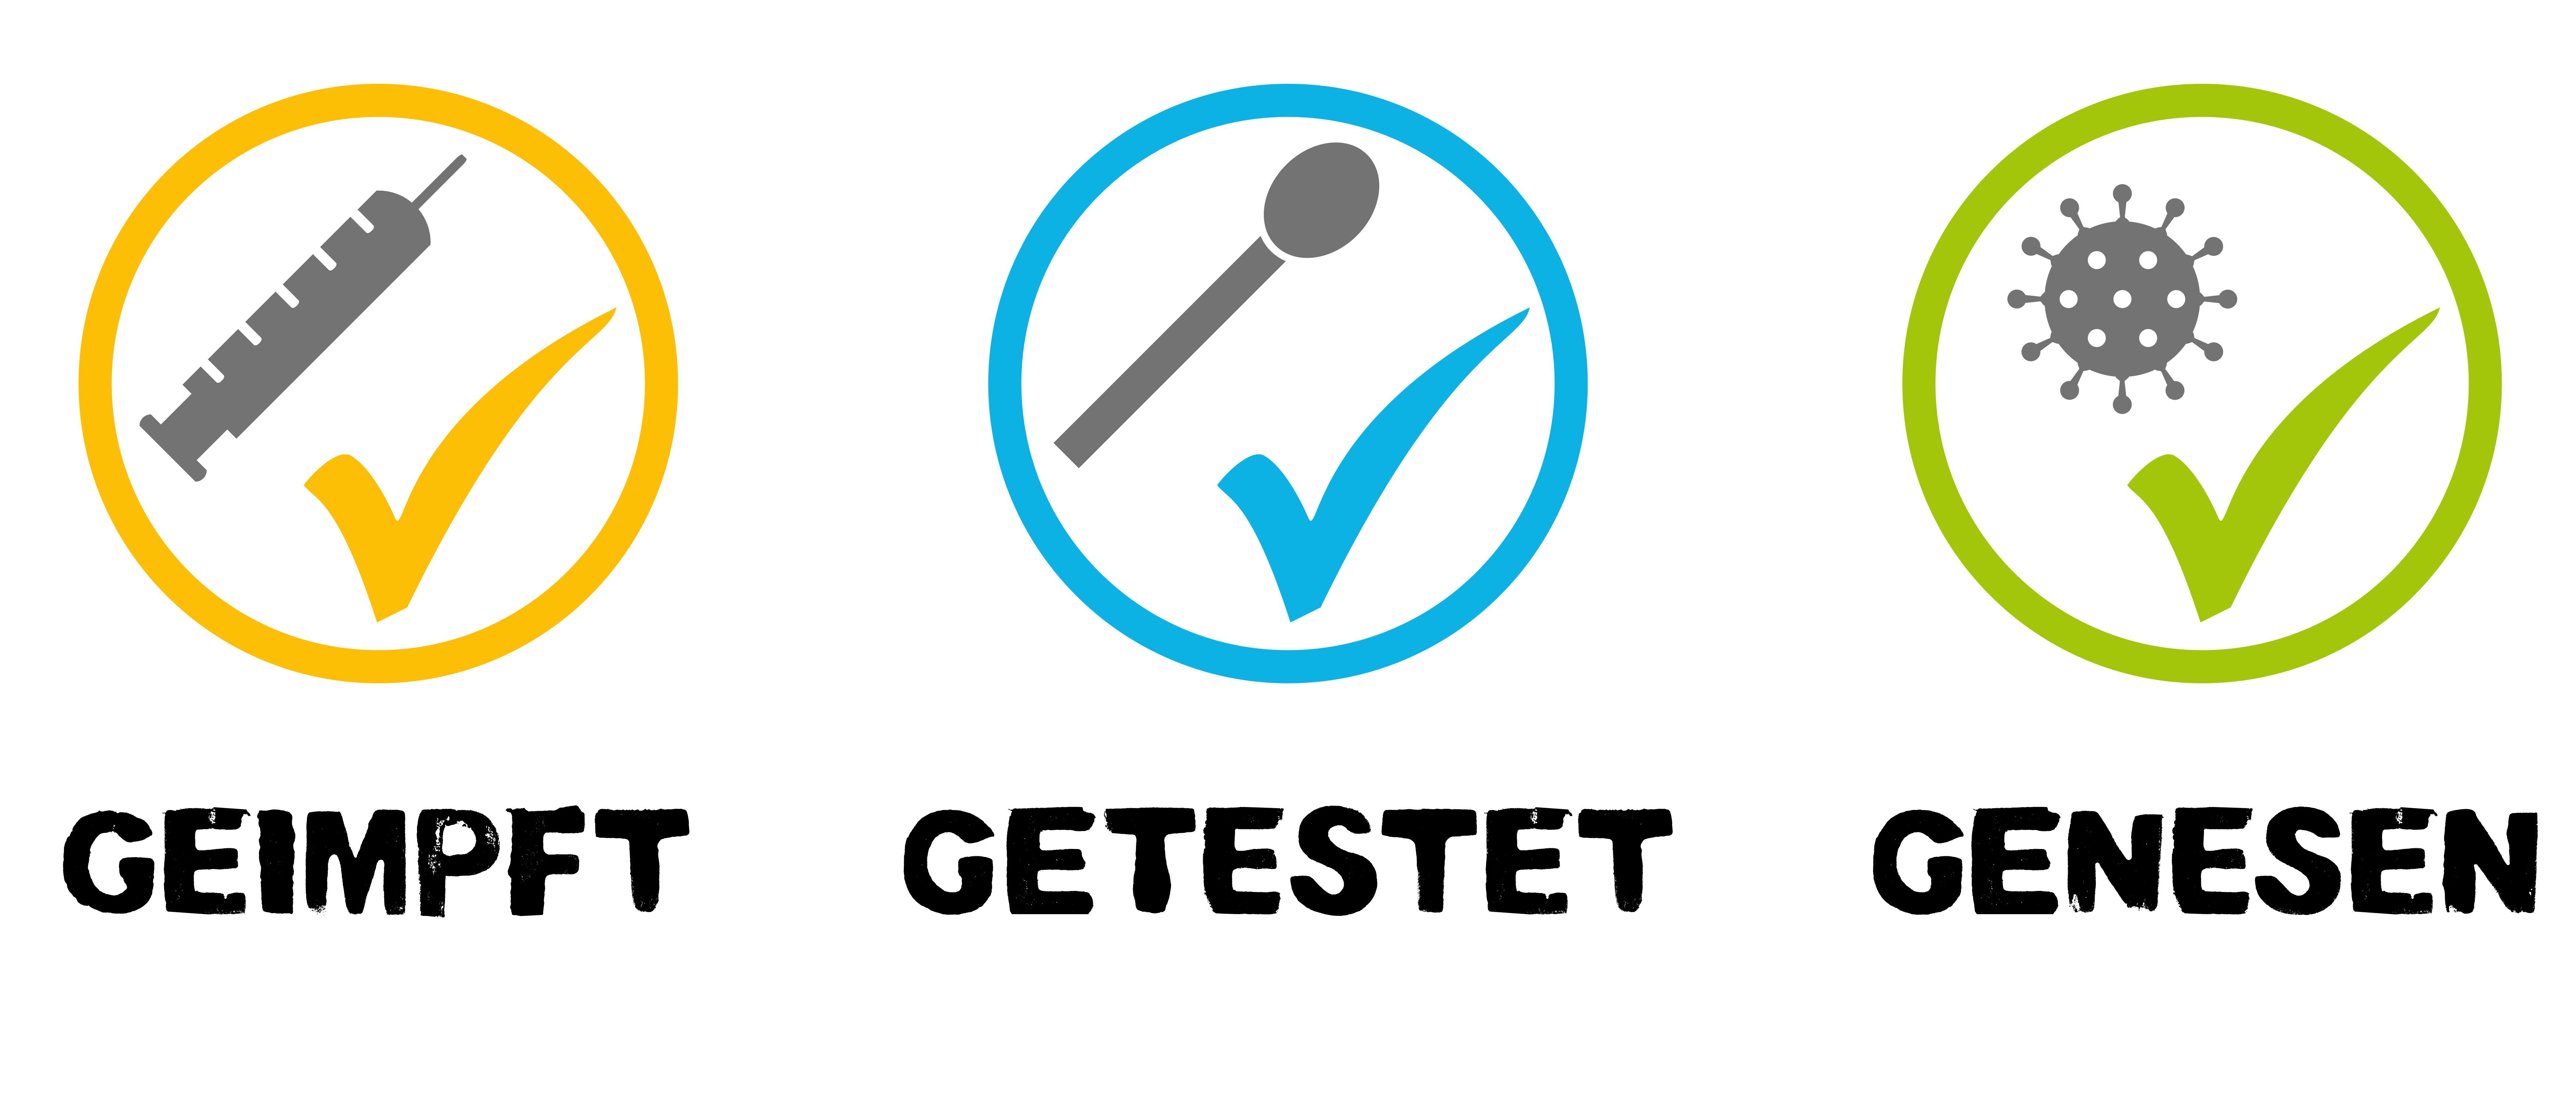 3G-Regel_AdobeStock_433044595